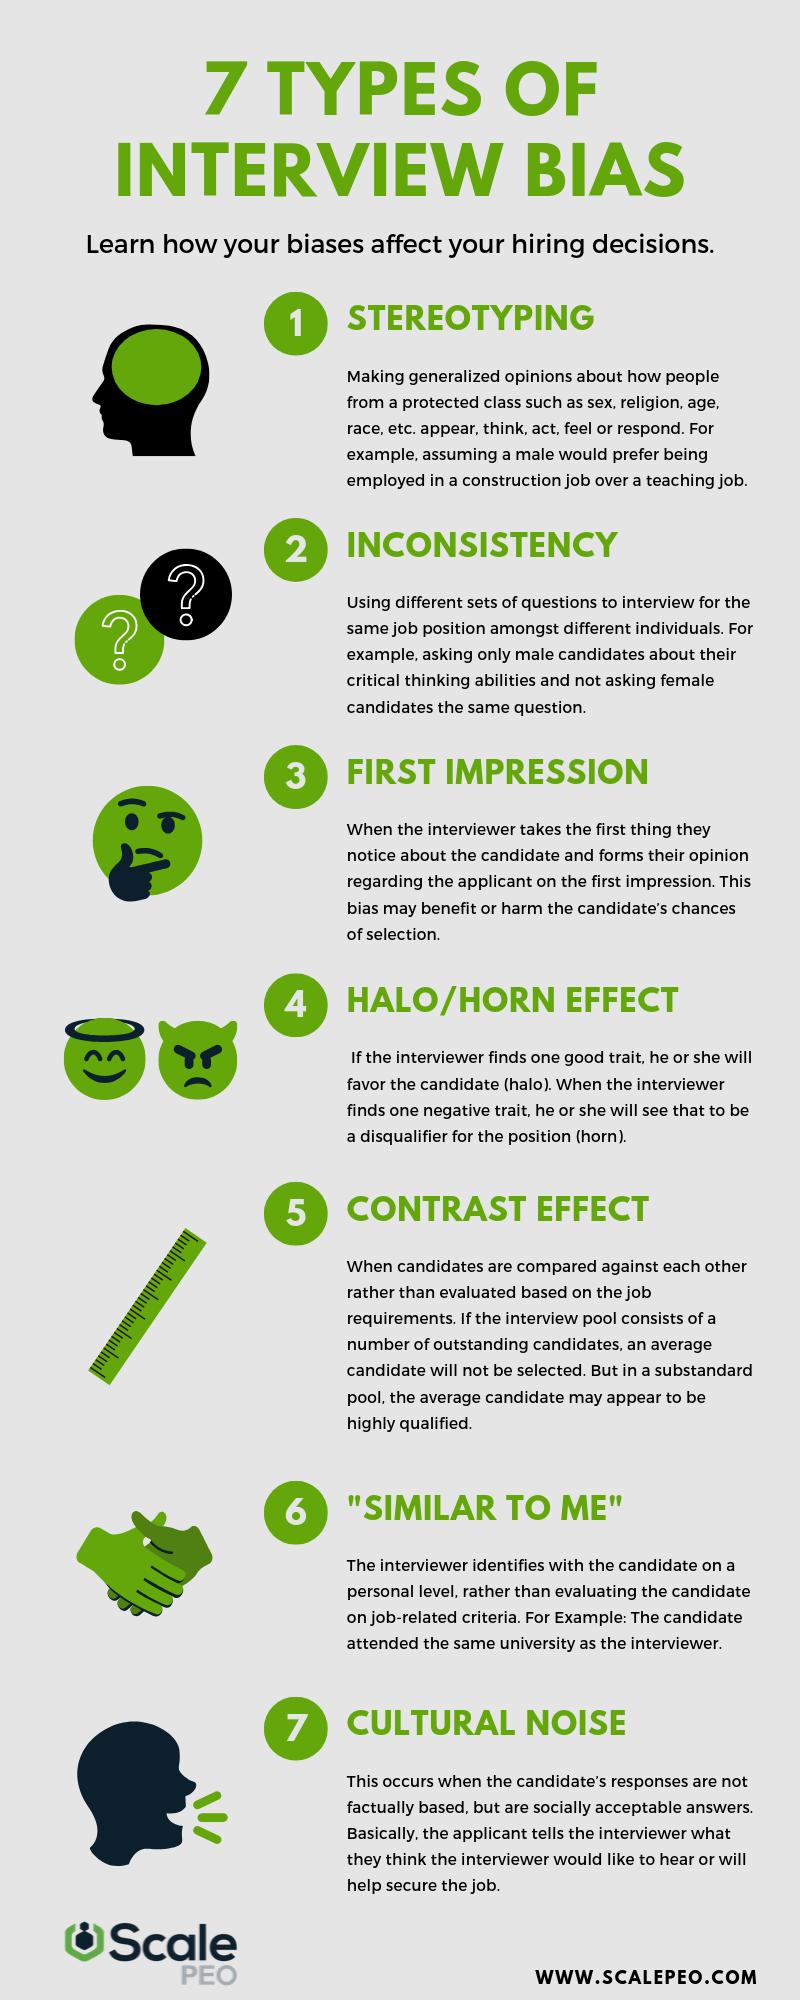 7 Types of Interview Bias